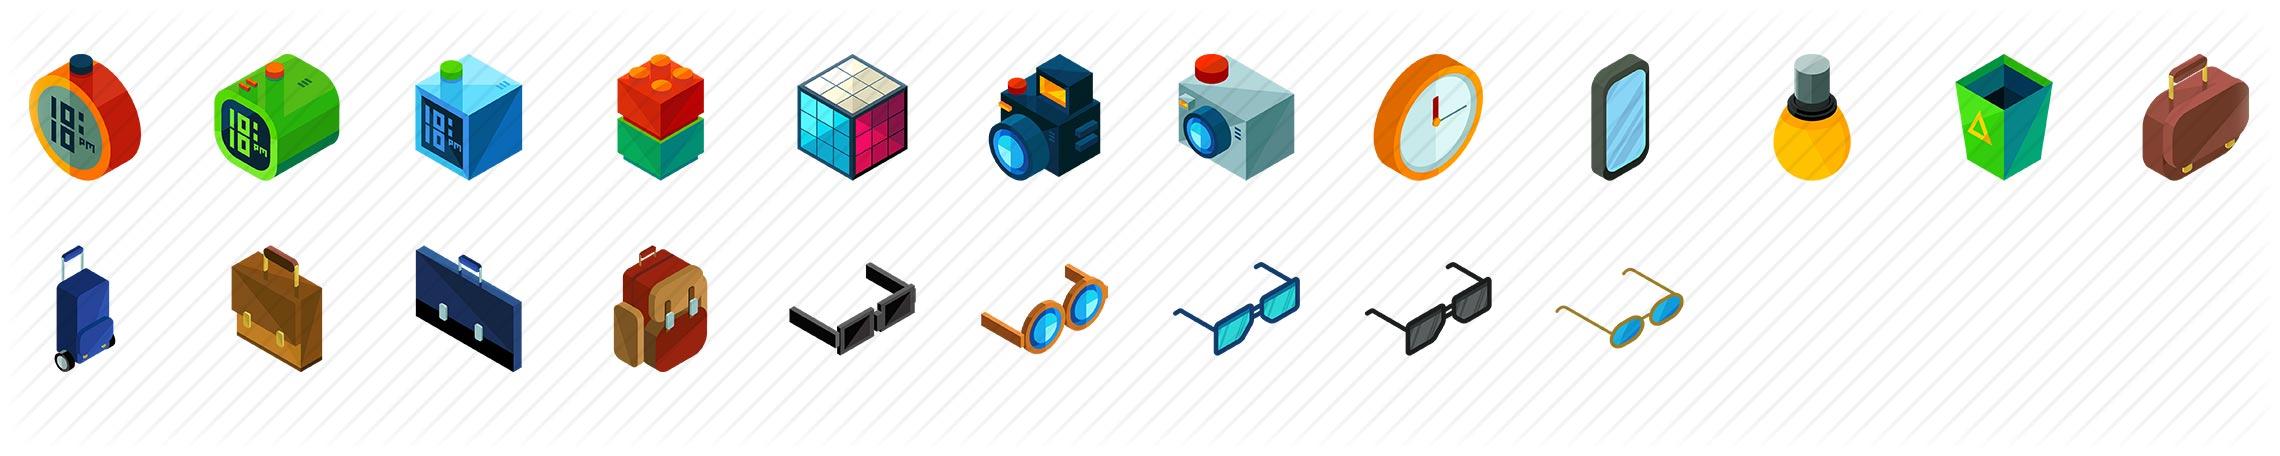 Interior Accessories Isometric Icons